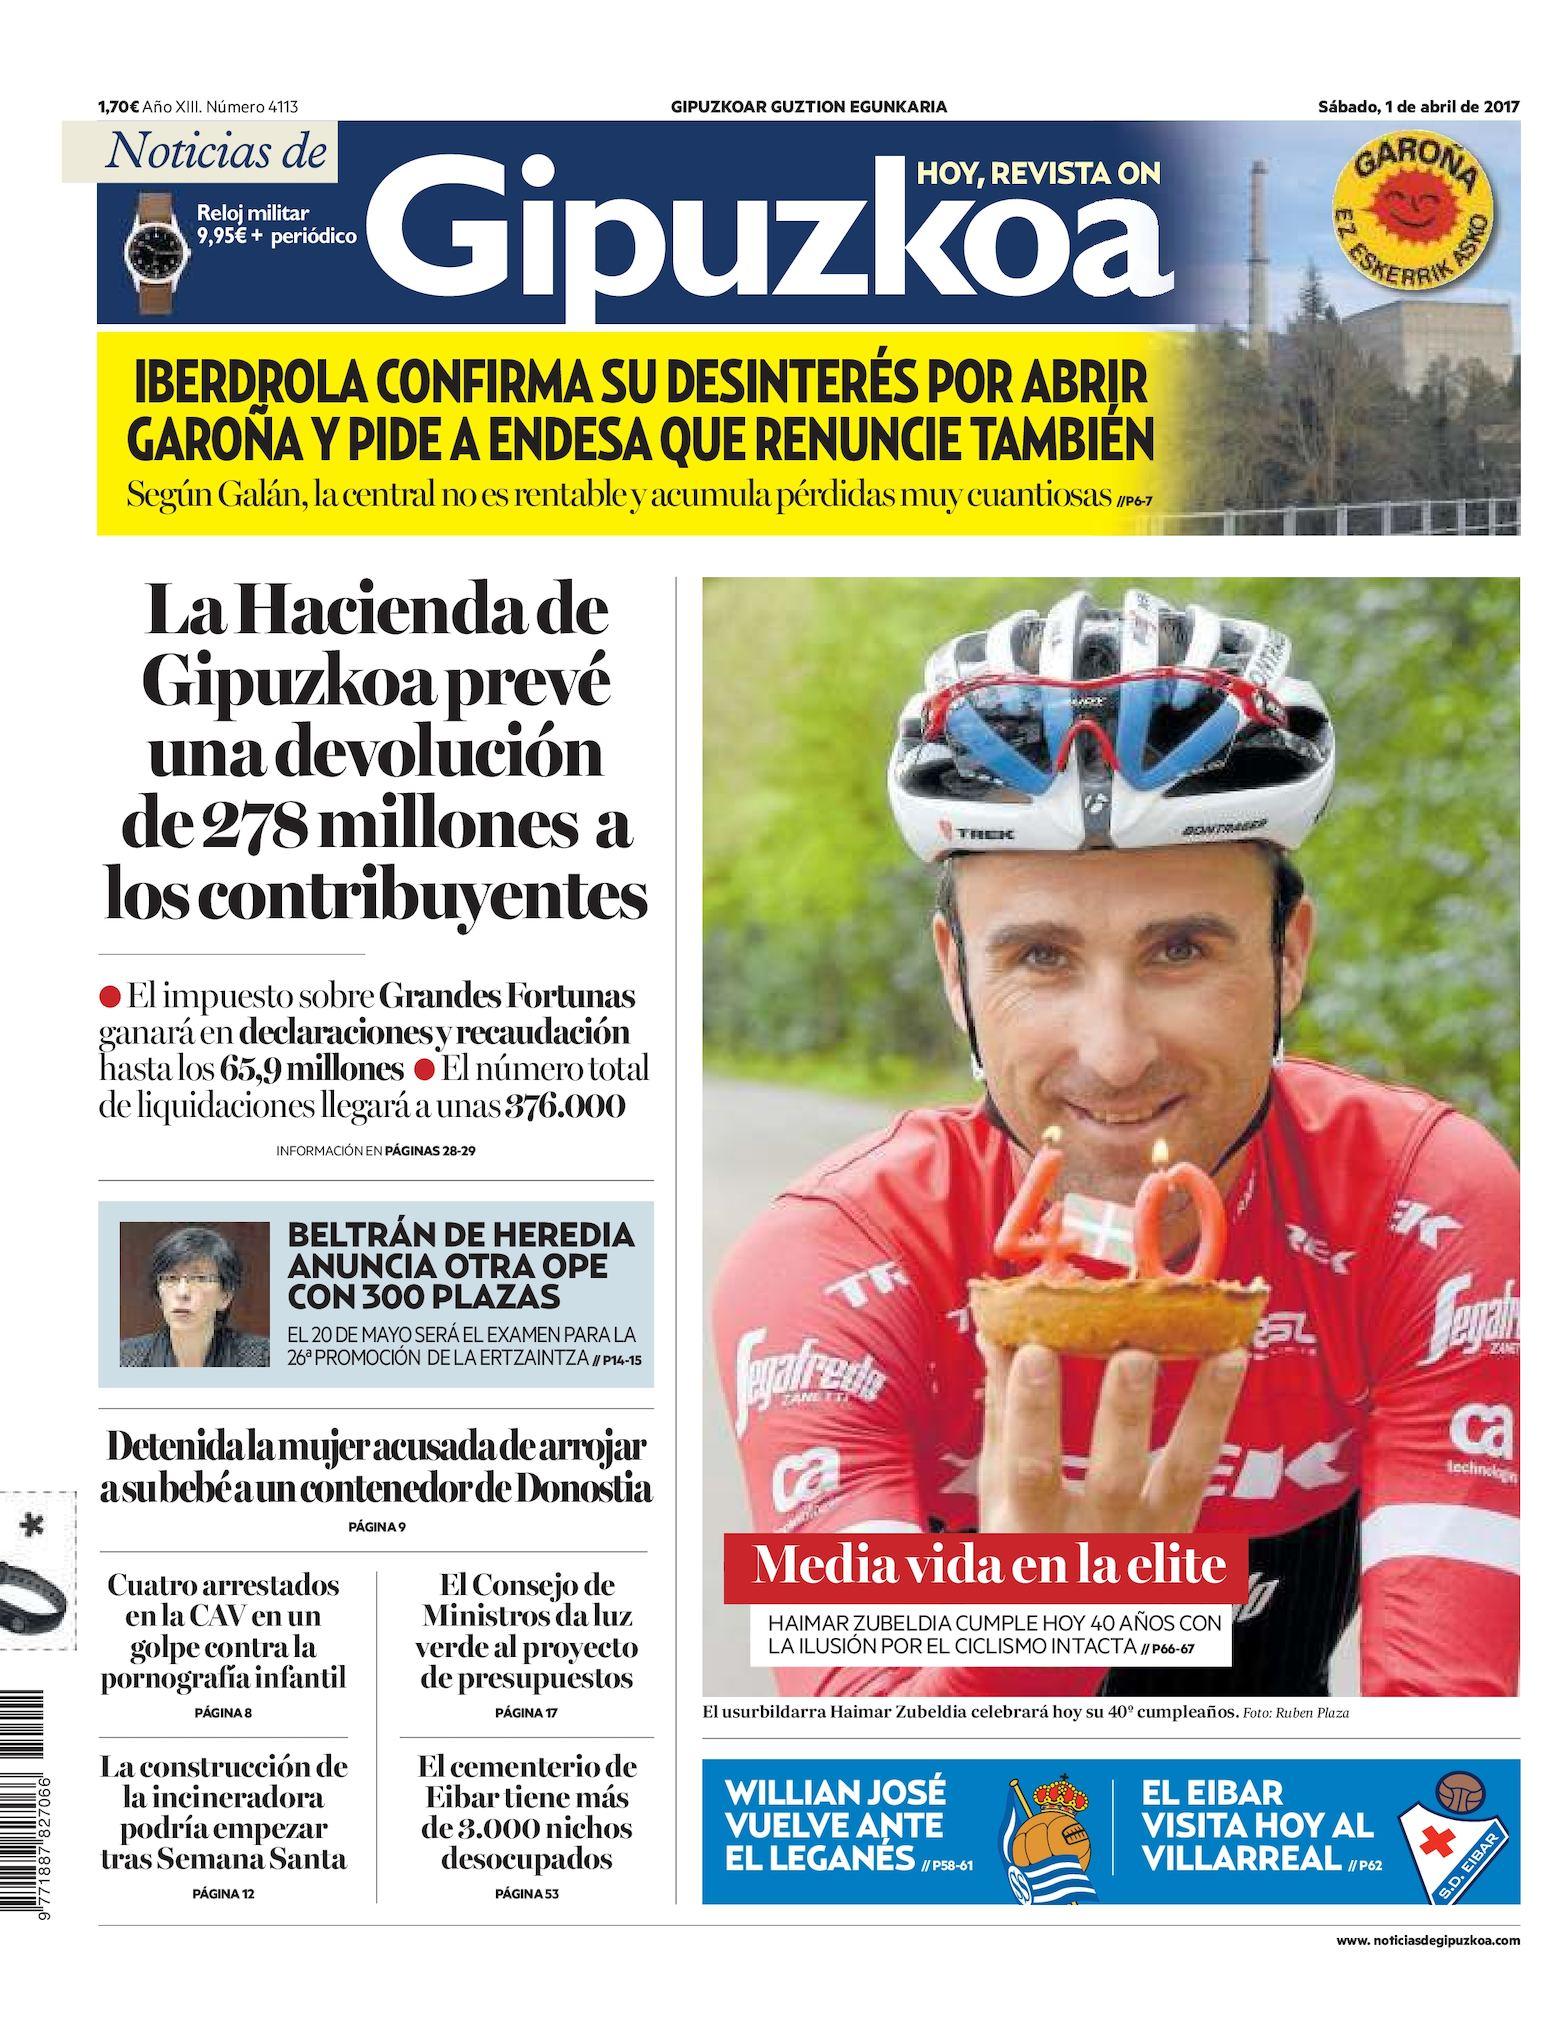 Amaranta Ruiz Culo calam�o - noticias de gipuzkoa 20170401